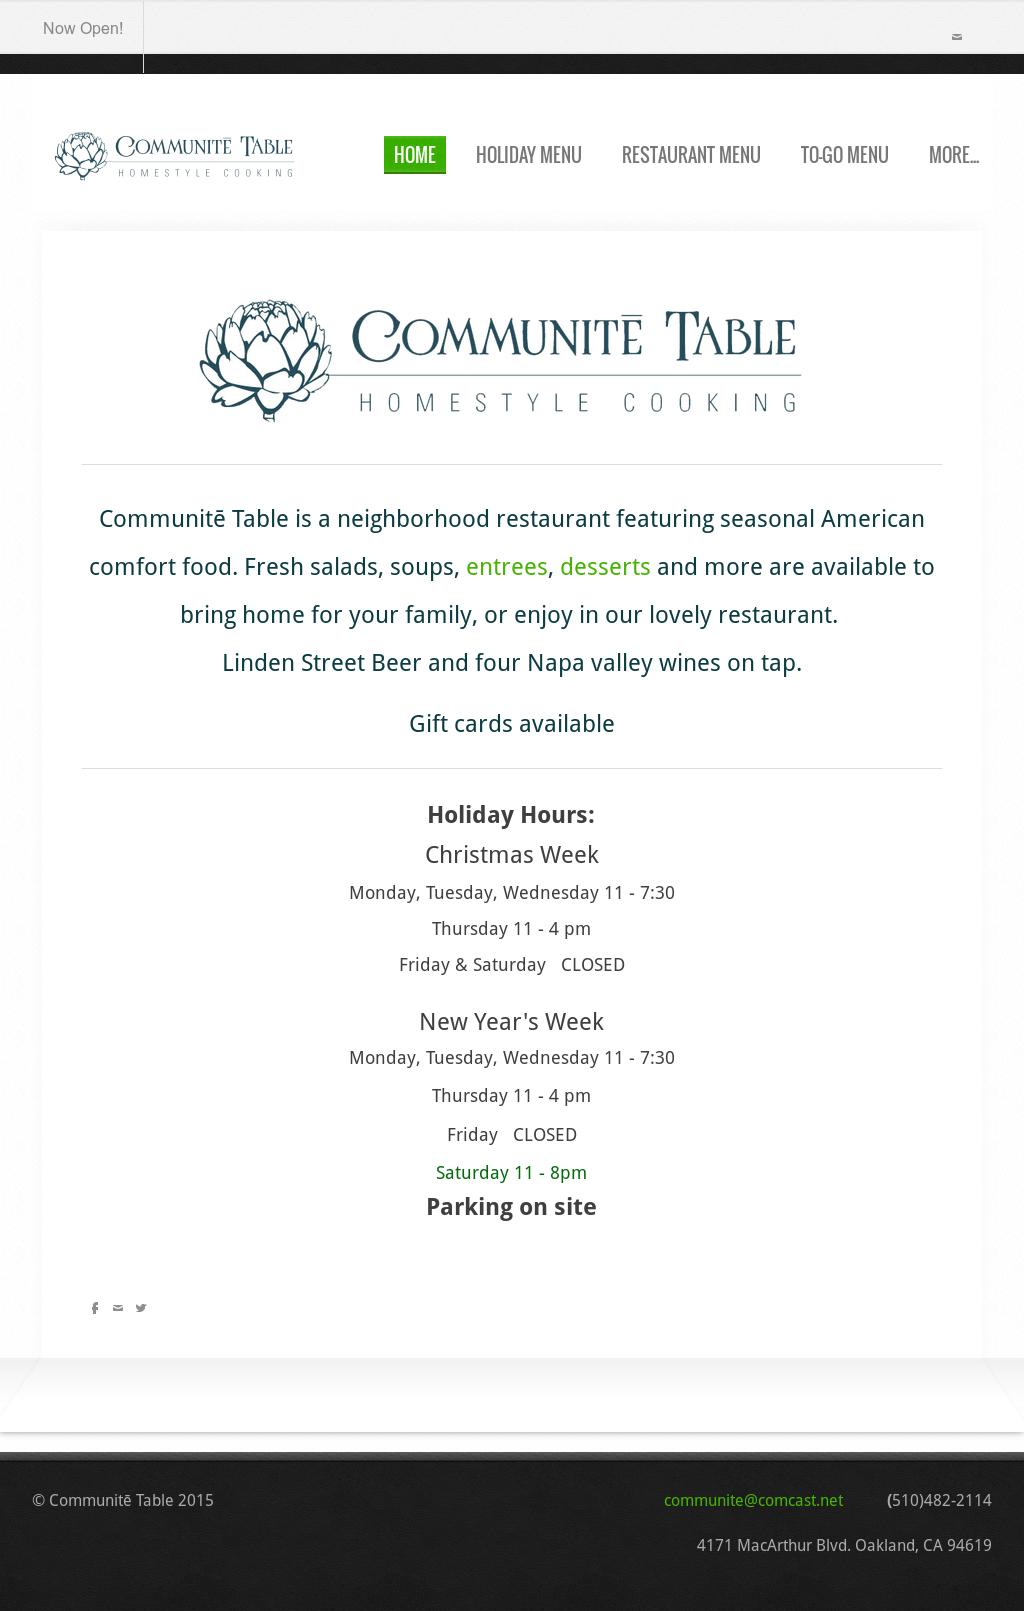 Communite Table Competitors Revenue And Employees Owler Company - Communite table